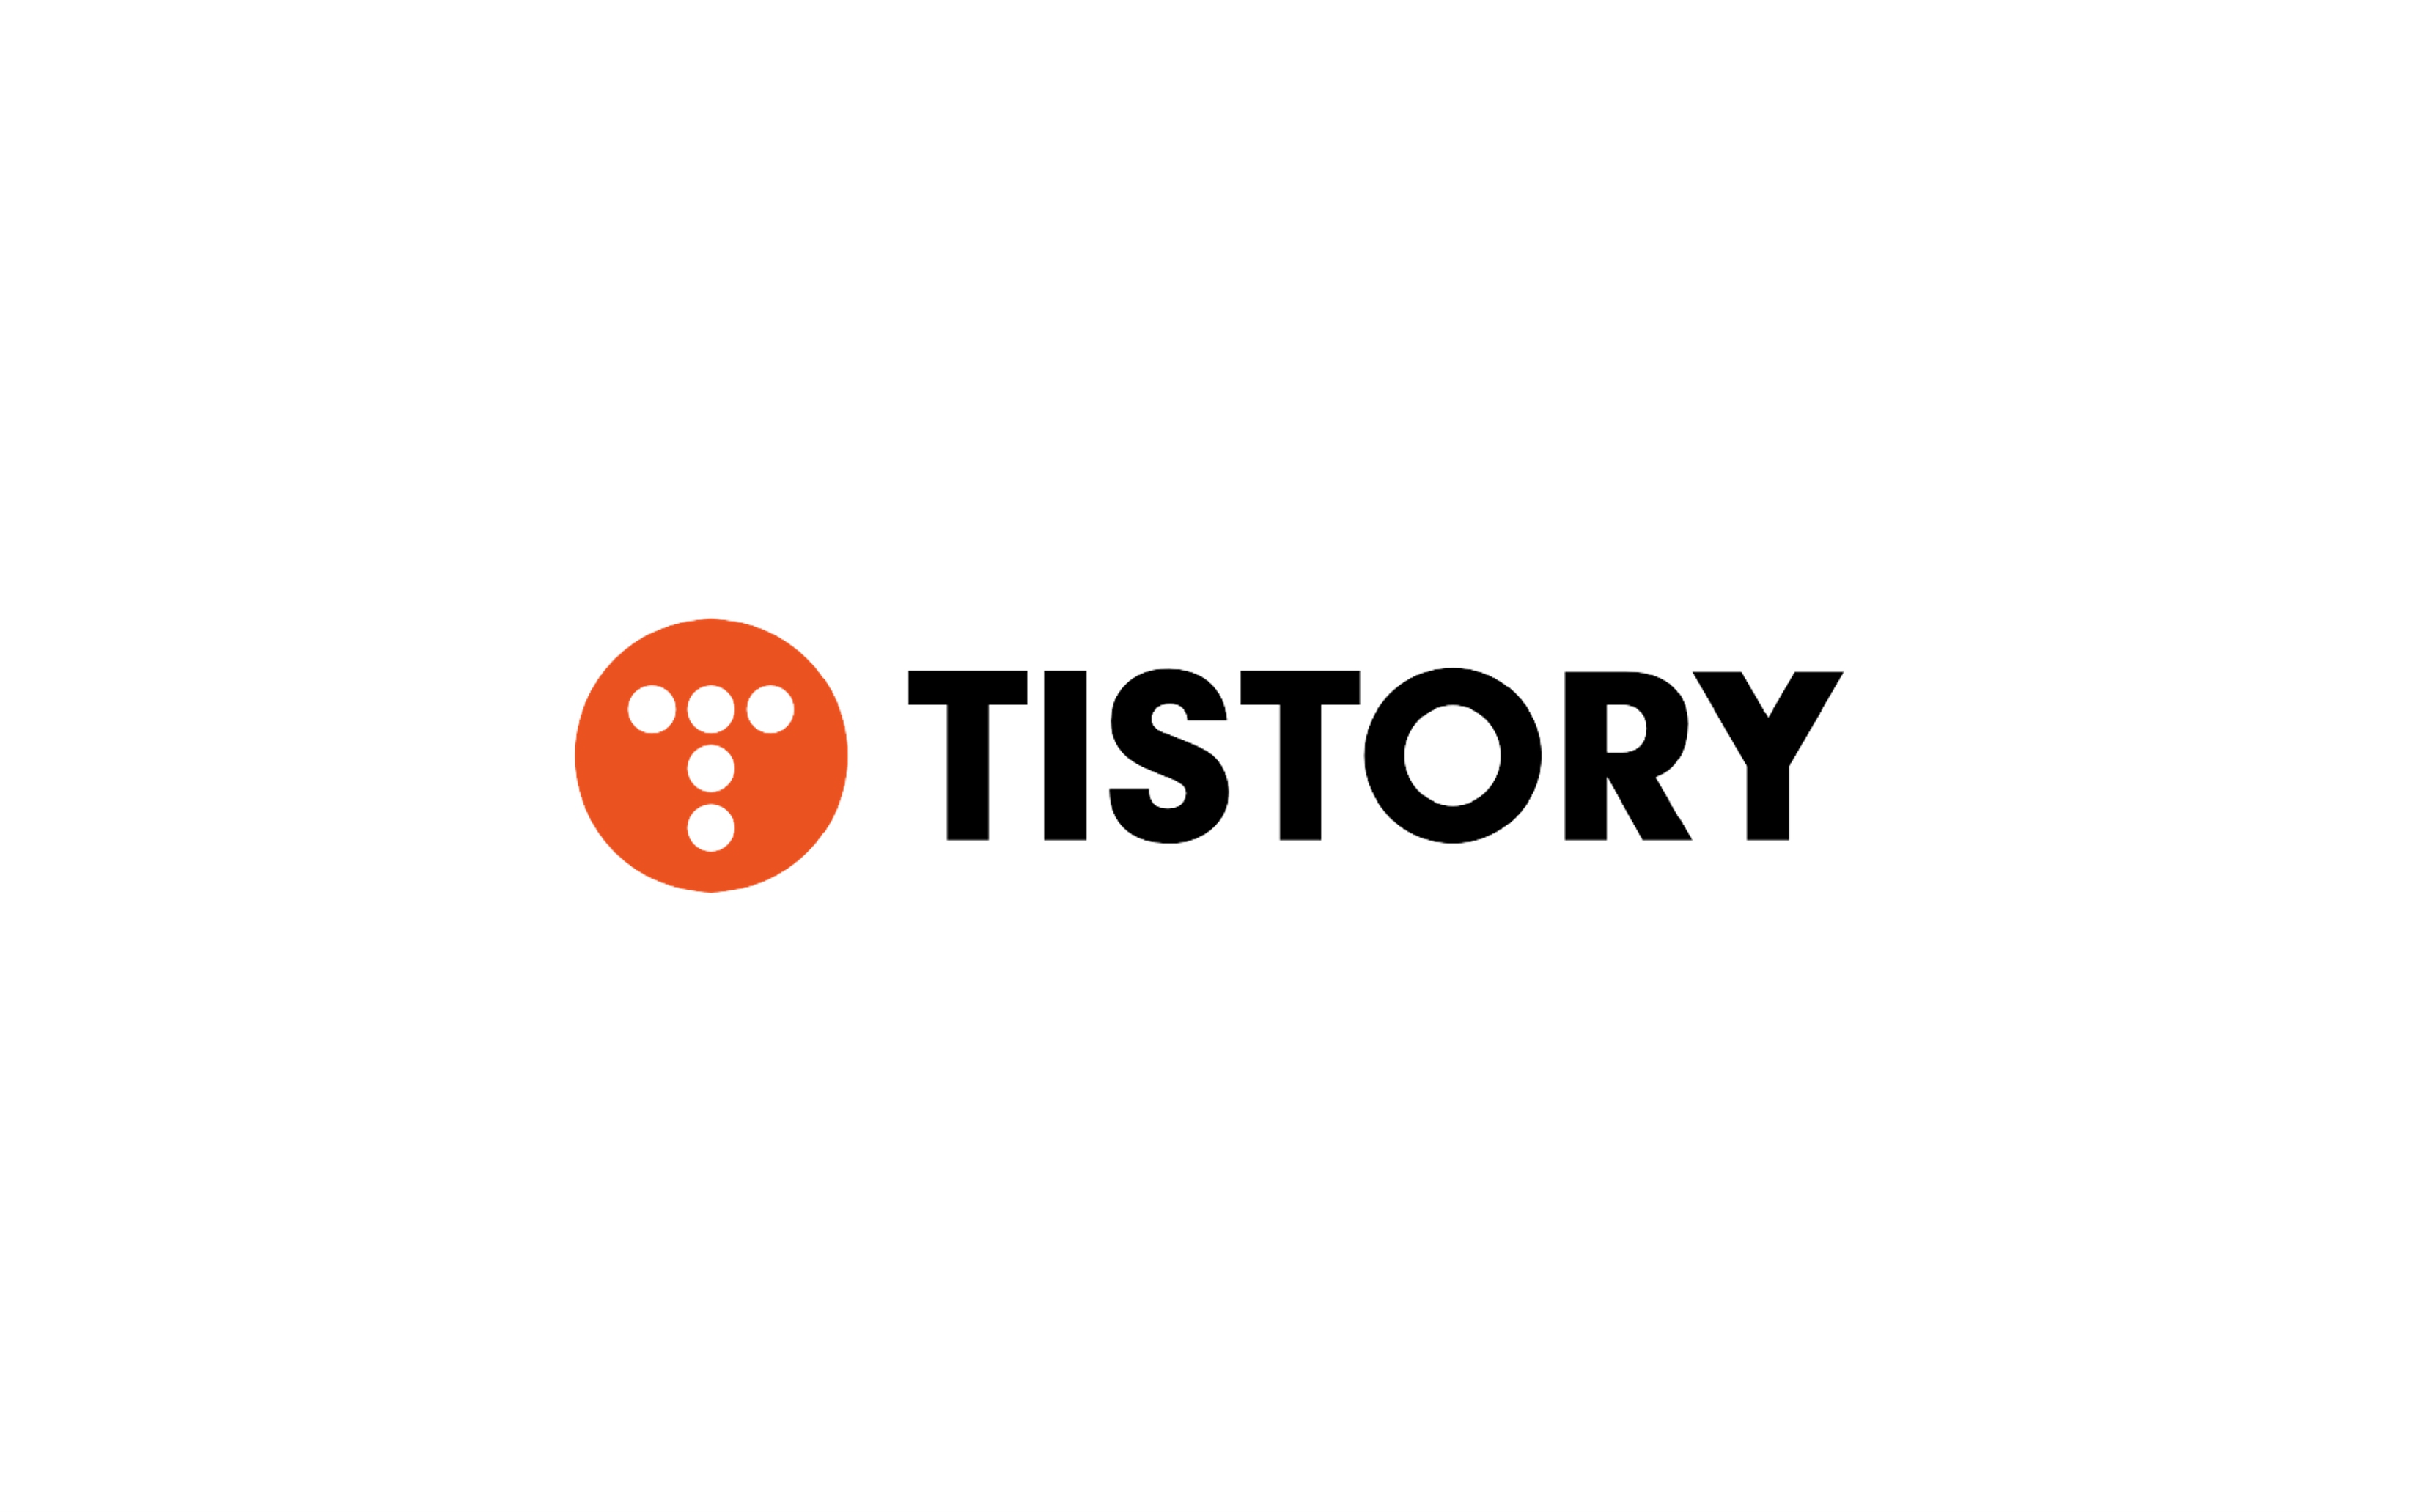 TISTORY 로고